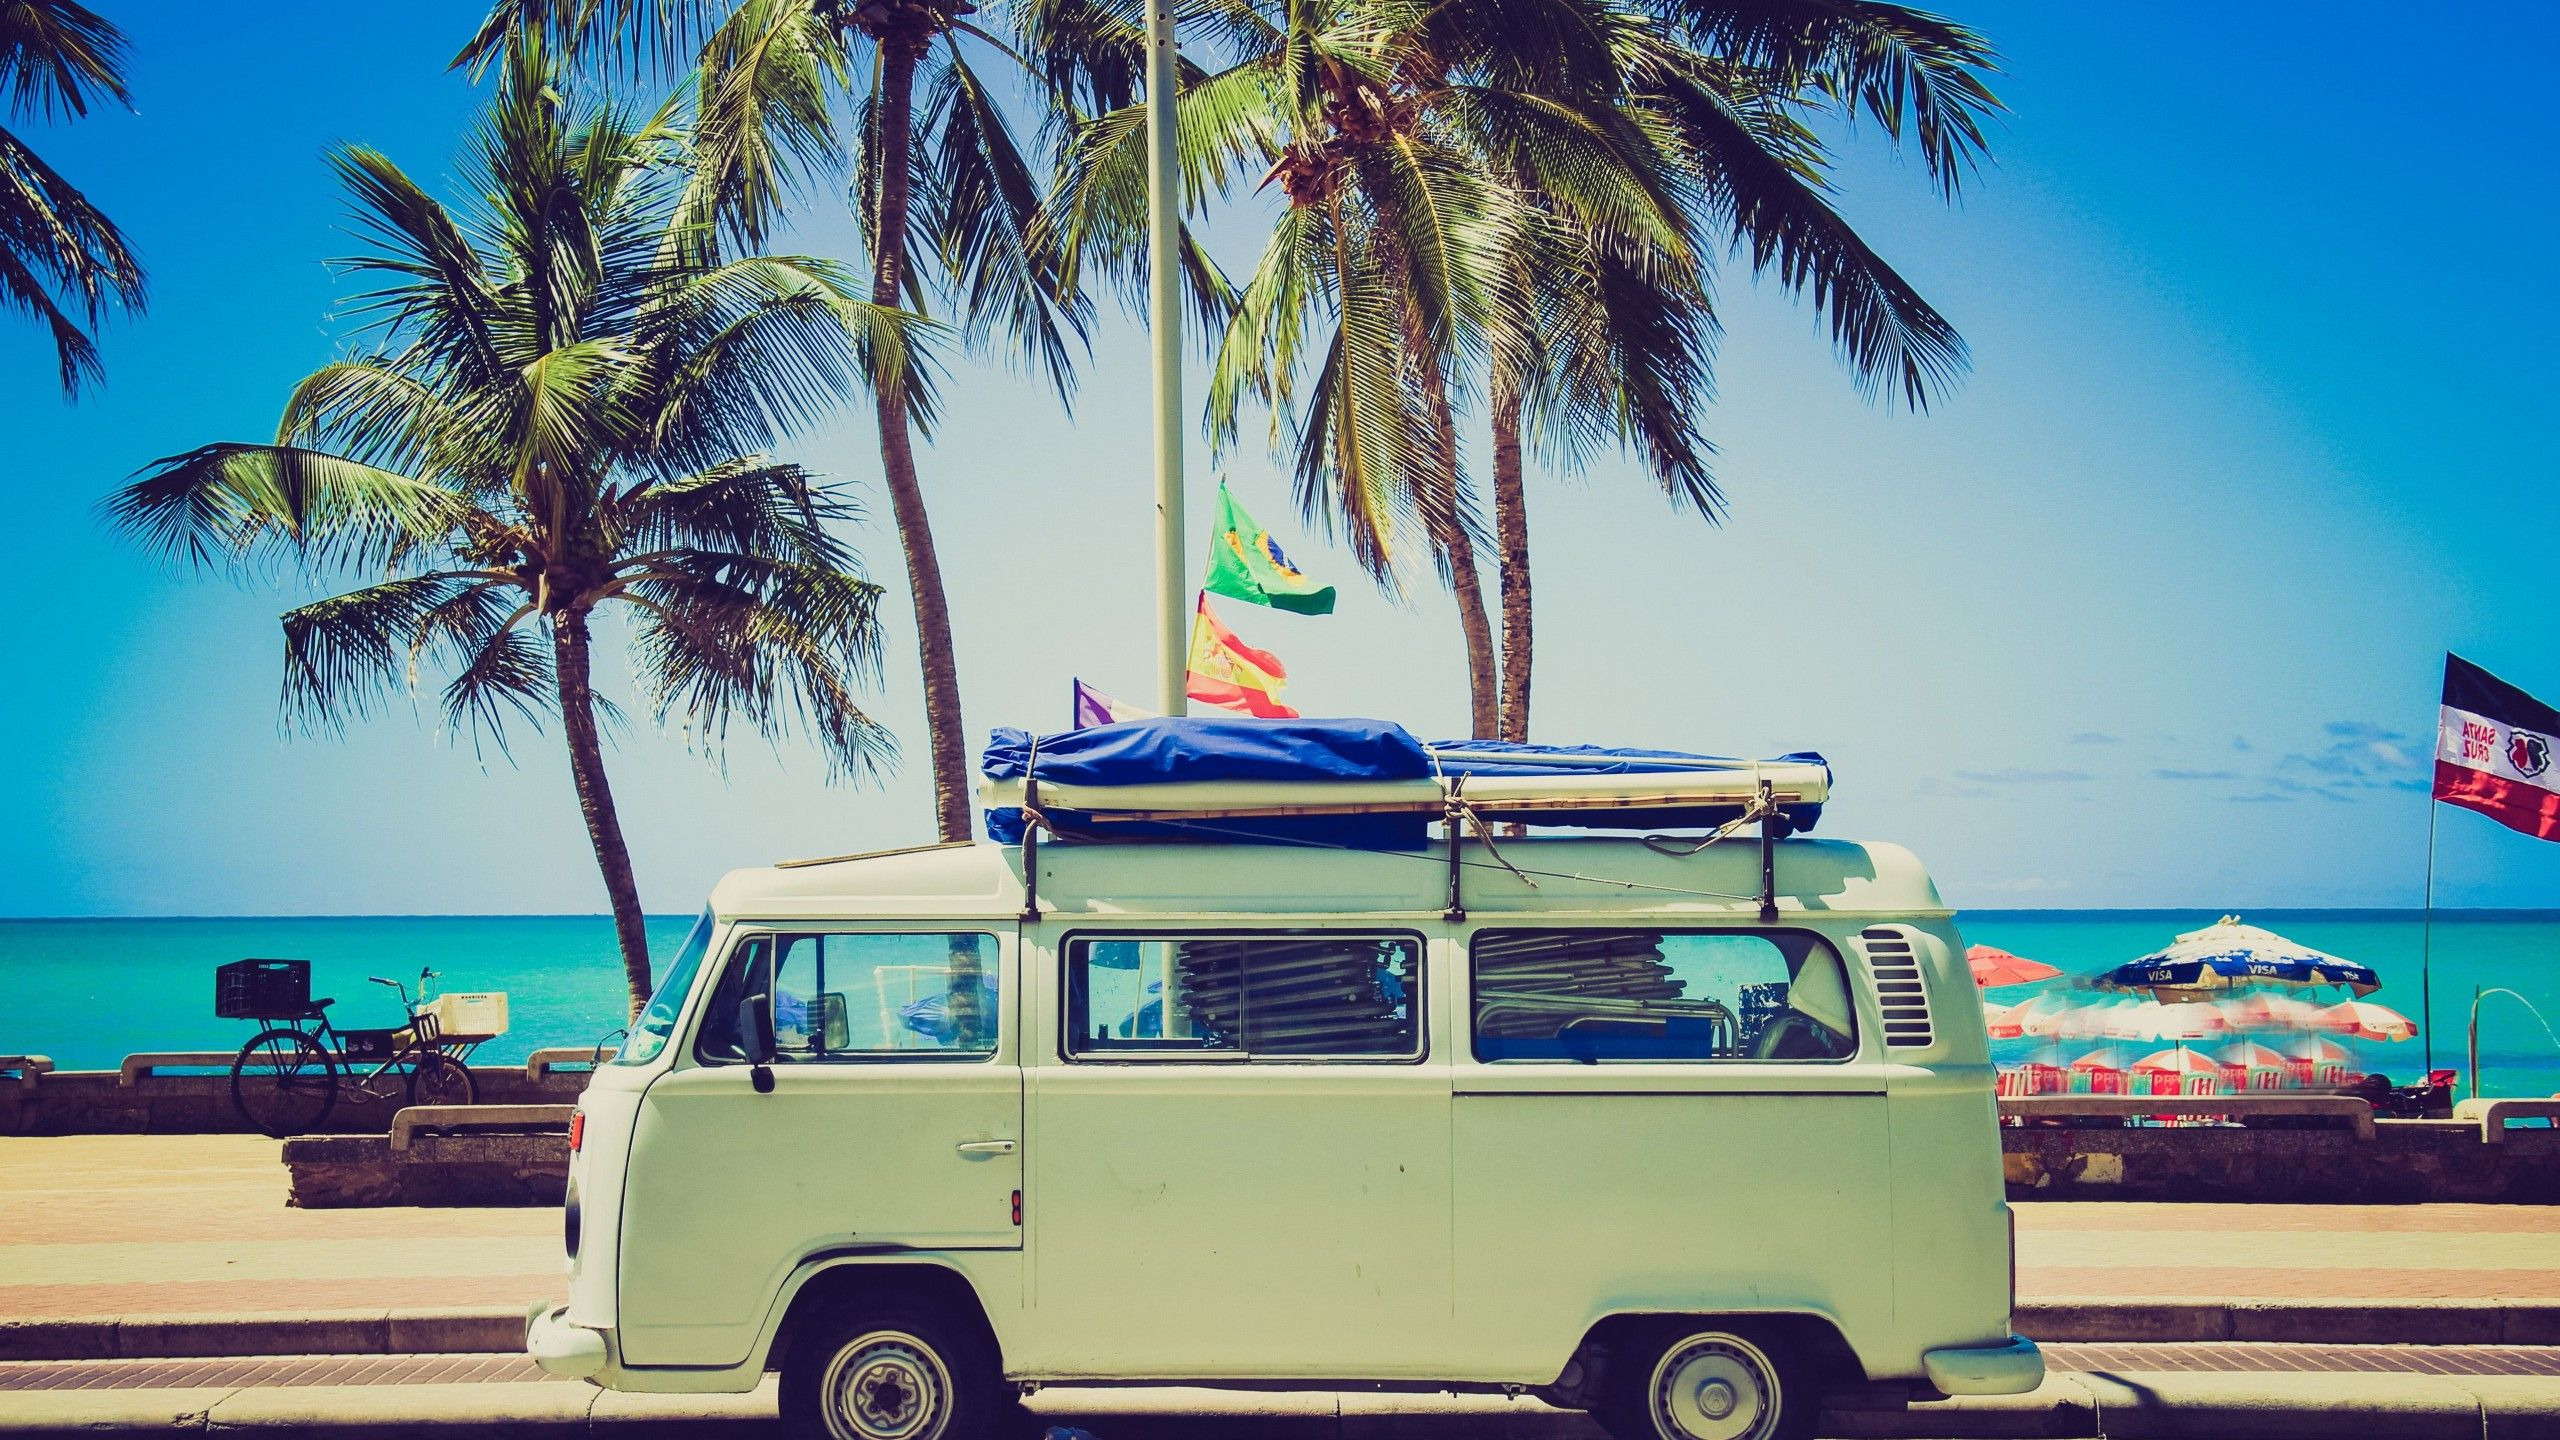 Beach Vw Van Wallpapers On Wallpaperdog